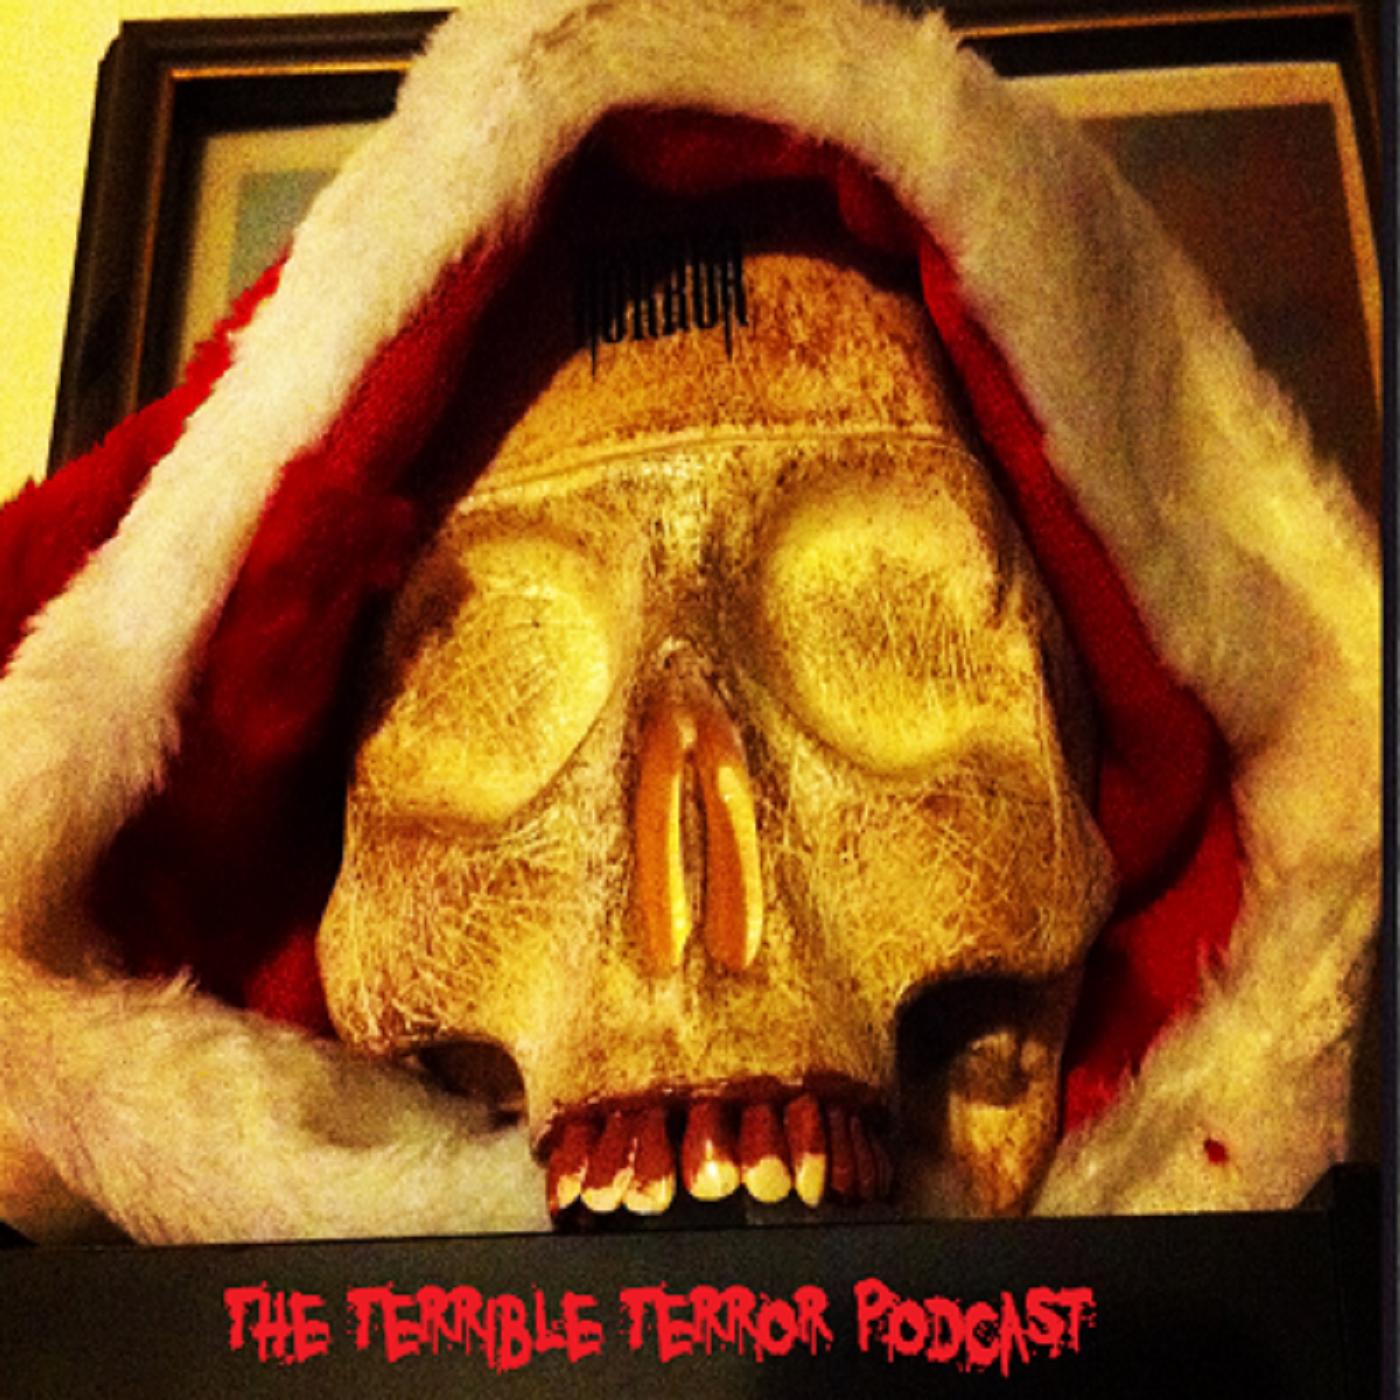 The Terrible Terror Podcast